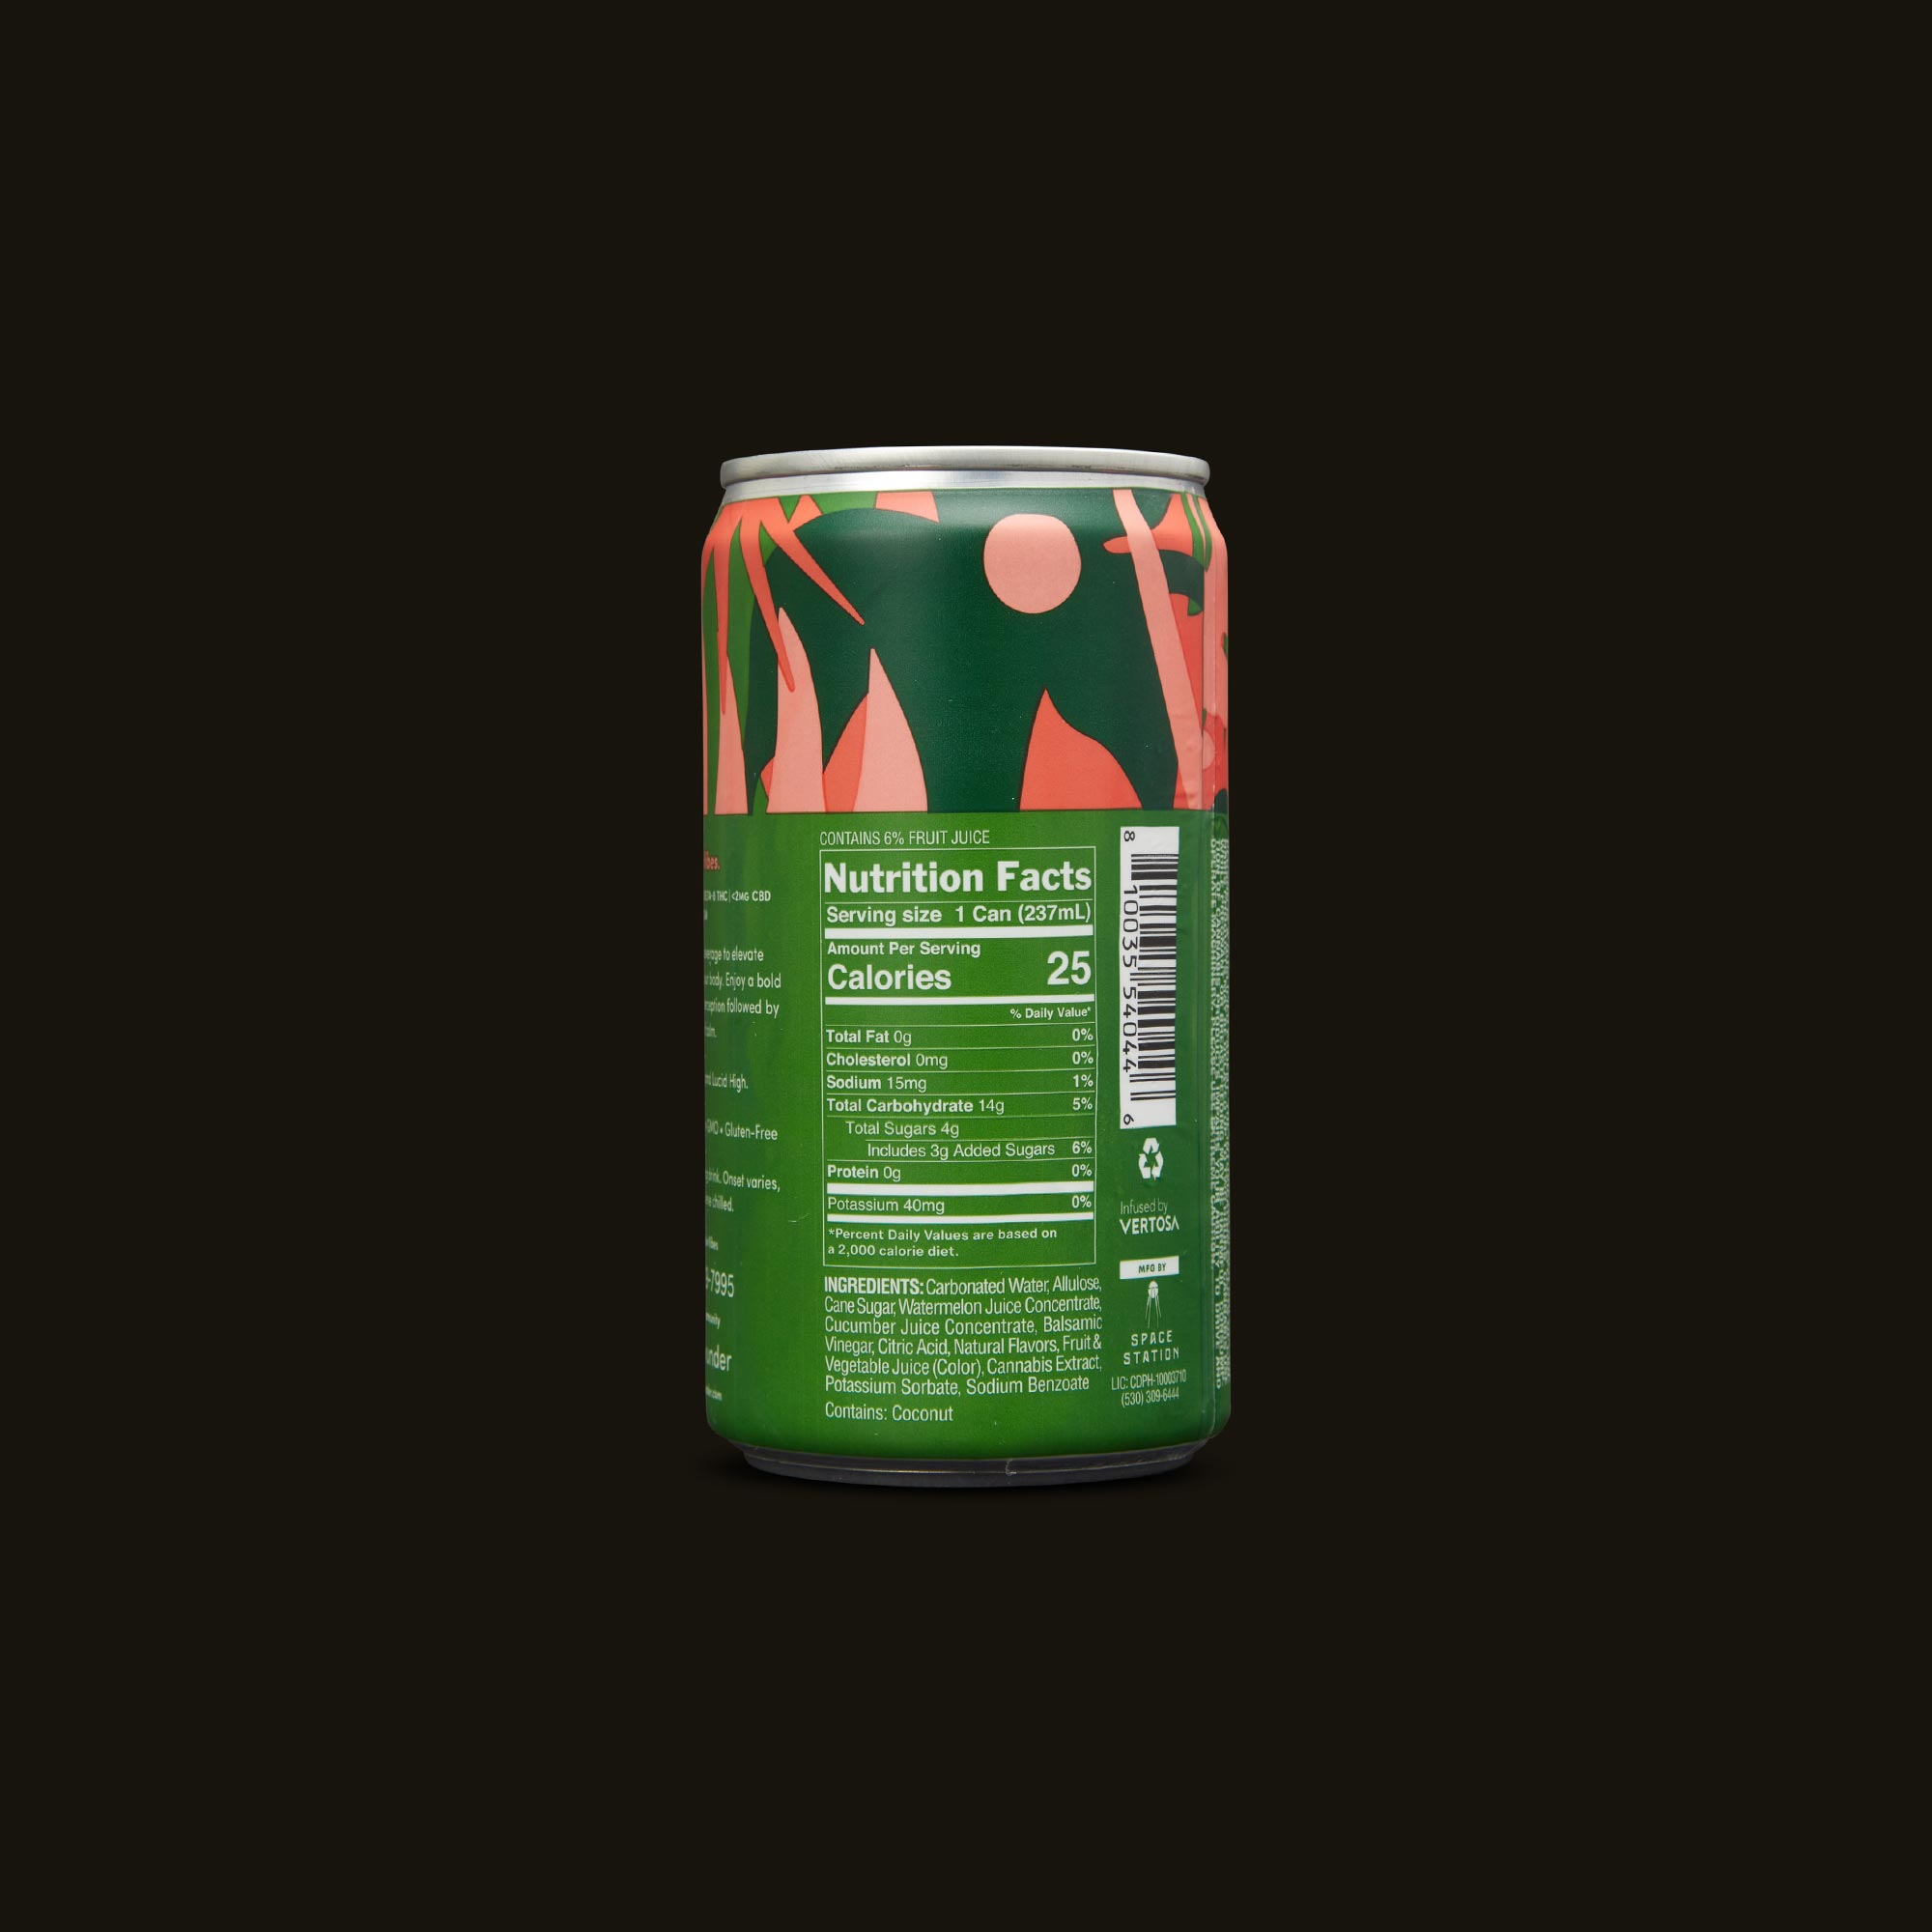 Sodas Beverage by Wunder